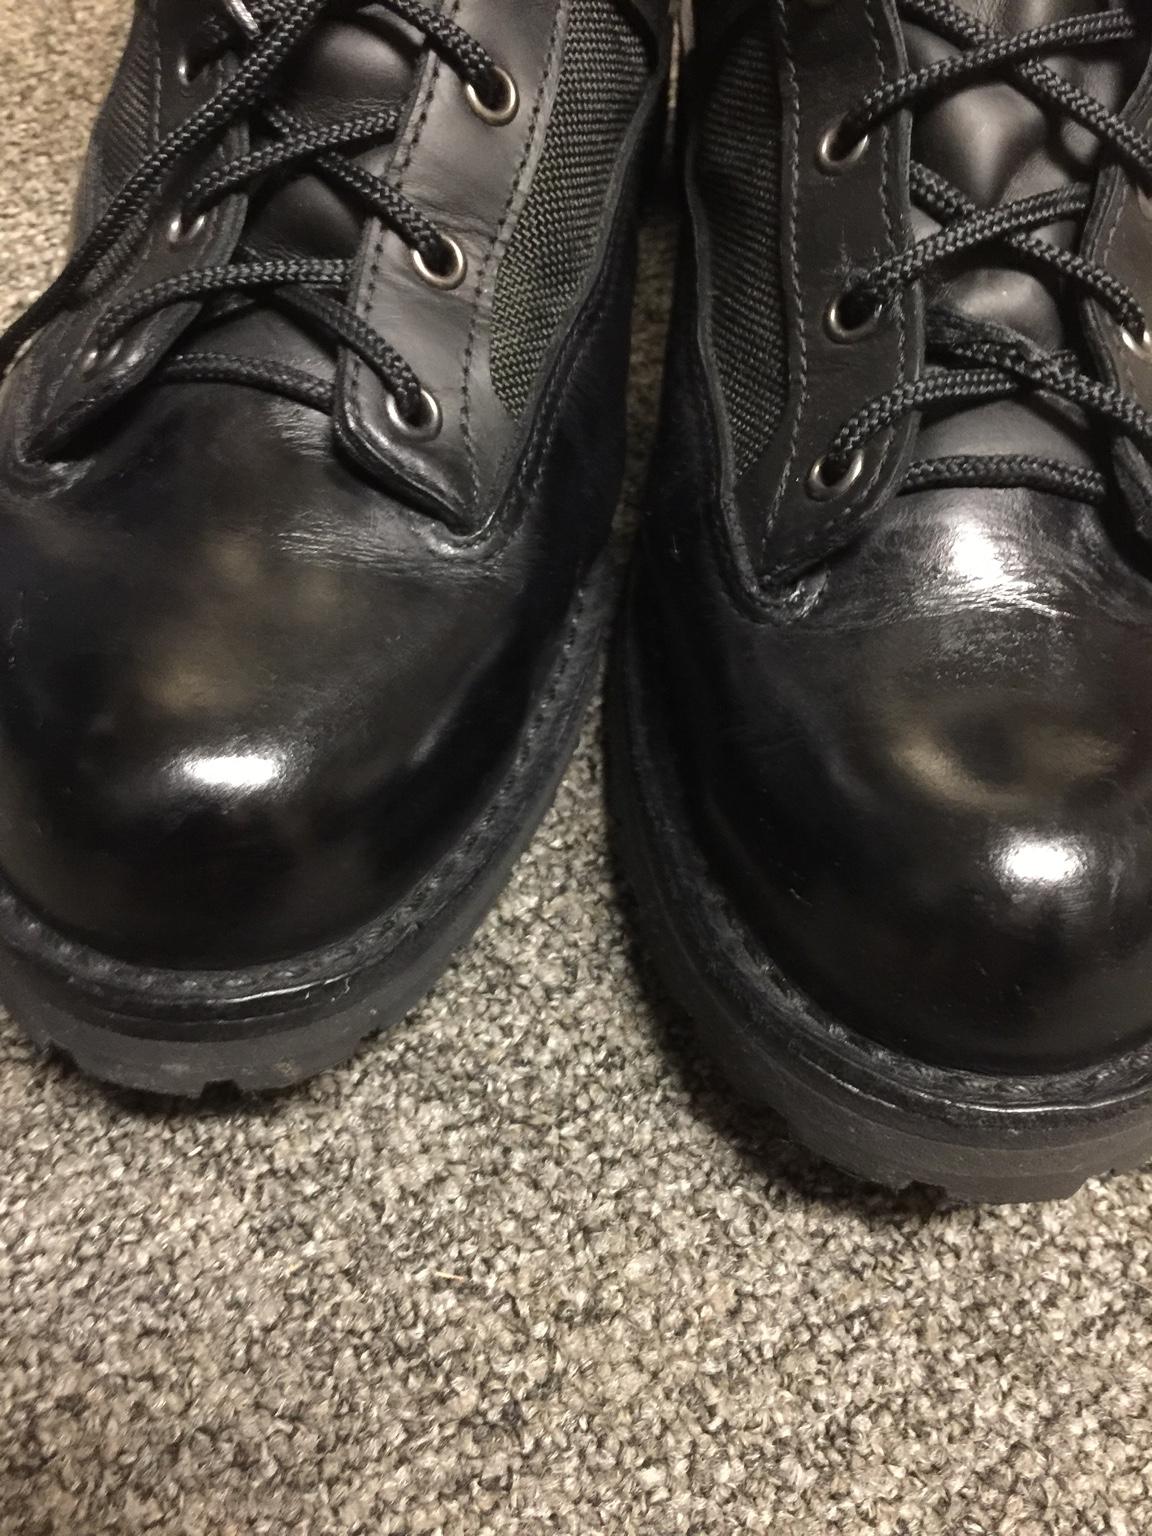 Boots Won T Shine Police Forums Amp Law Enforcement Forums